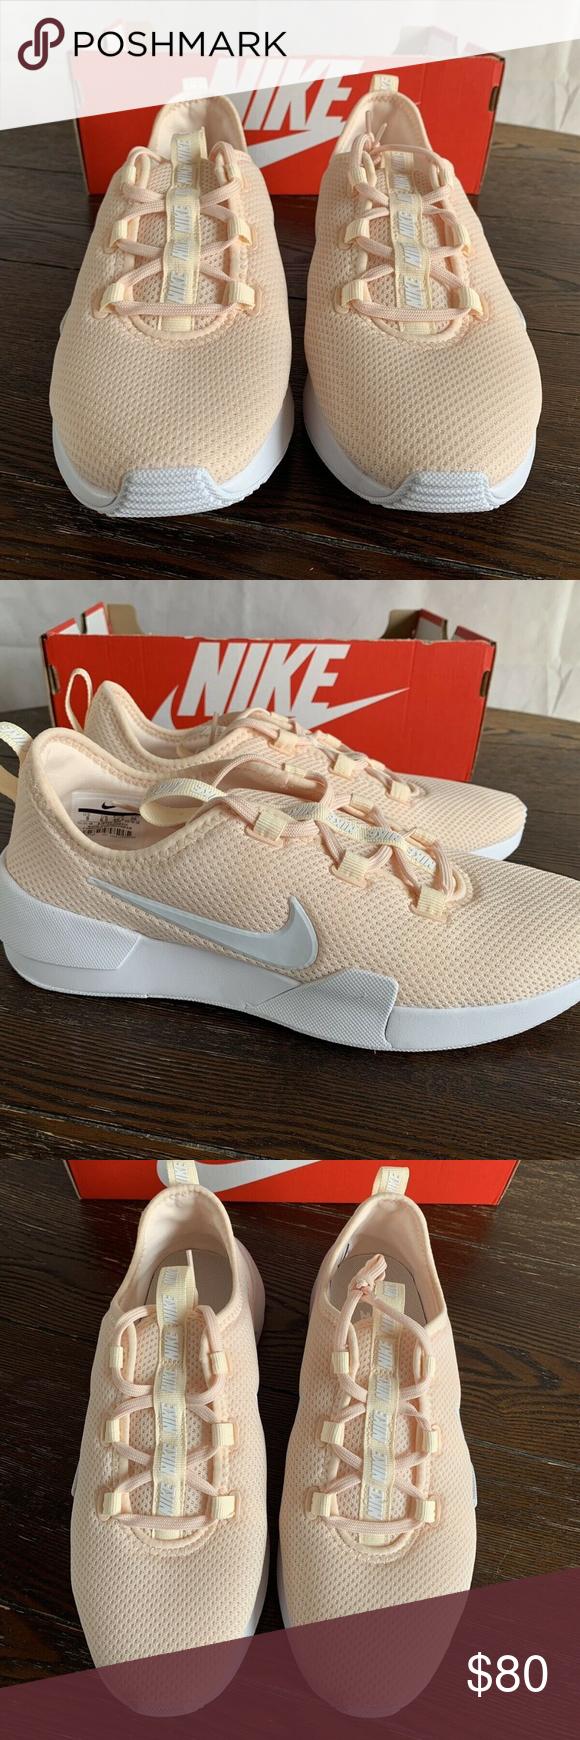 2fe46186ae3fc4 Nike Ashin Modern 9 Running Shoes Guava Ice Nike Ashin Modern Womens Size 9 Running  Shoes